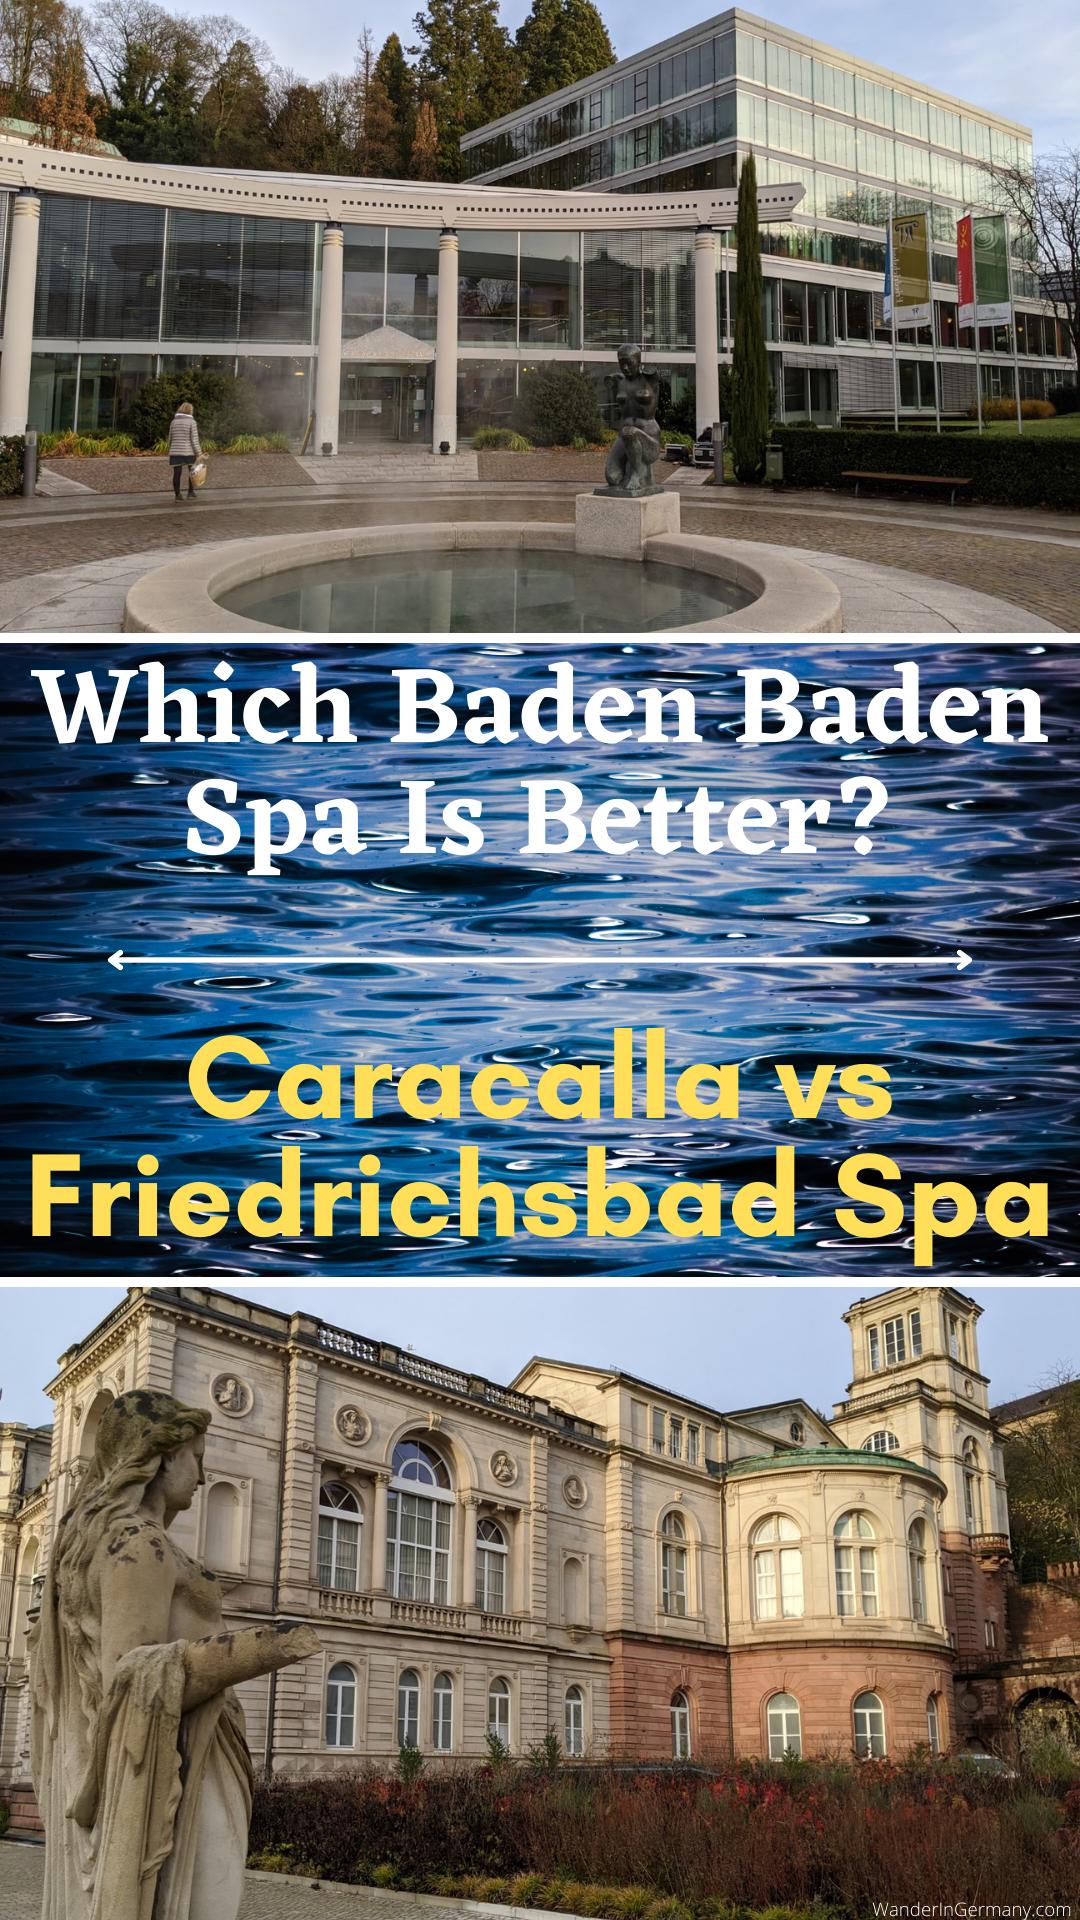 Is caracalla or Friedrichsbad better in Baden Baden